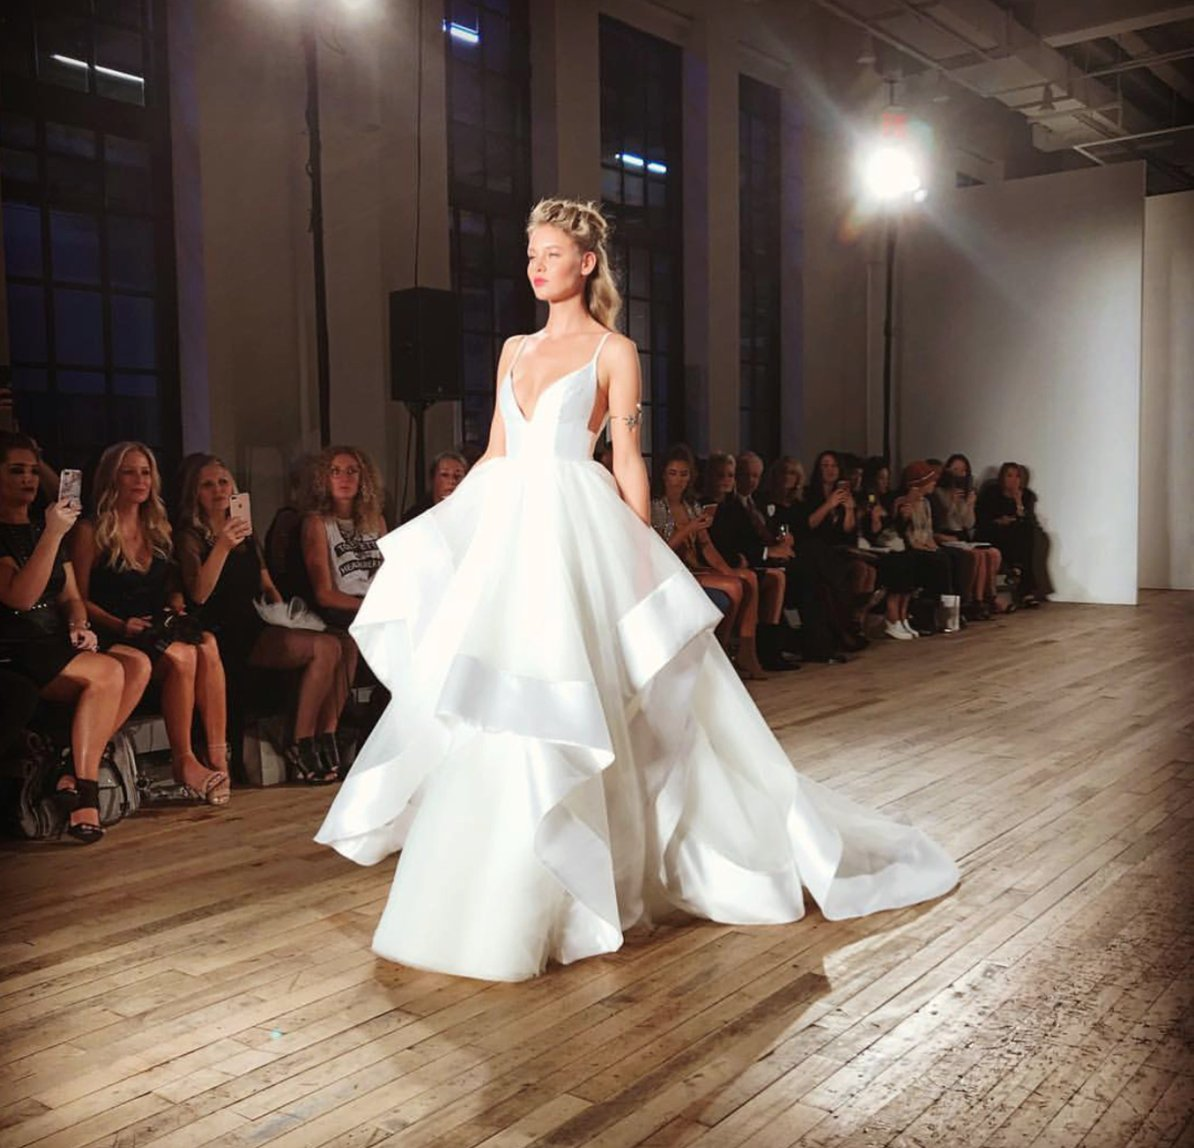 Wow! Day 2 of #bridalfashionweek brought so many beautiful designs! #nybfw #bridalmarket #bridalgown #bridalfashion #bridesofaustin https://t.co/LbiTbZz5il